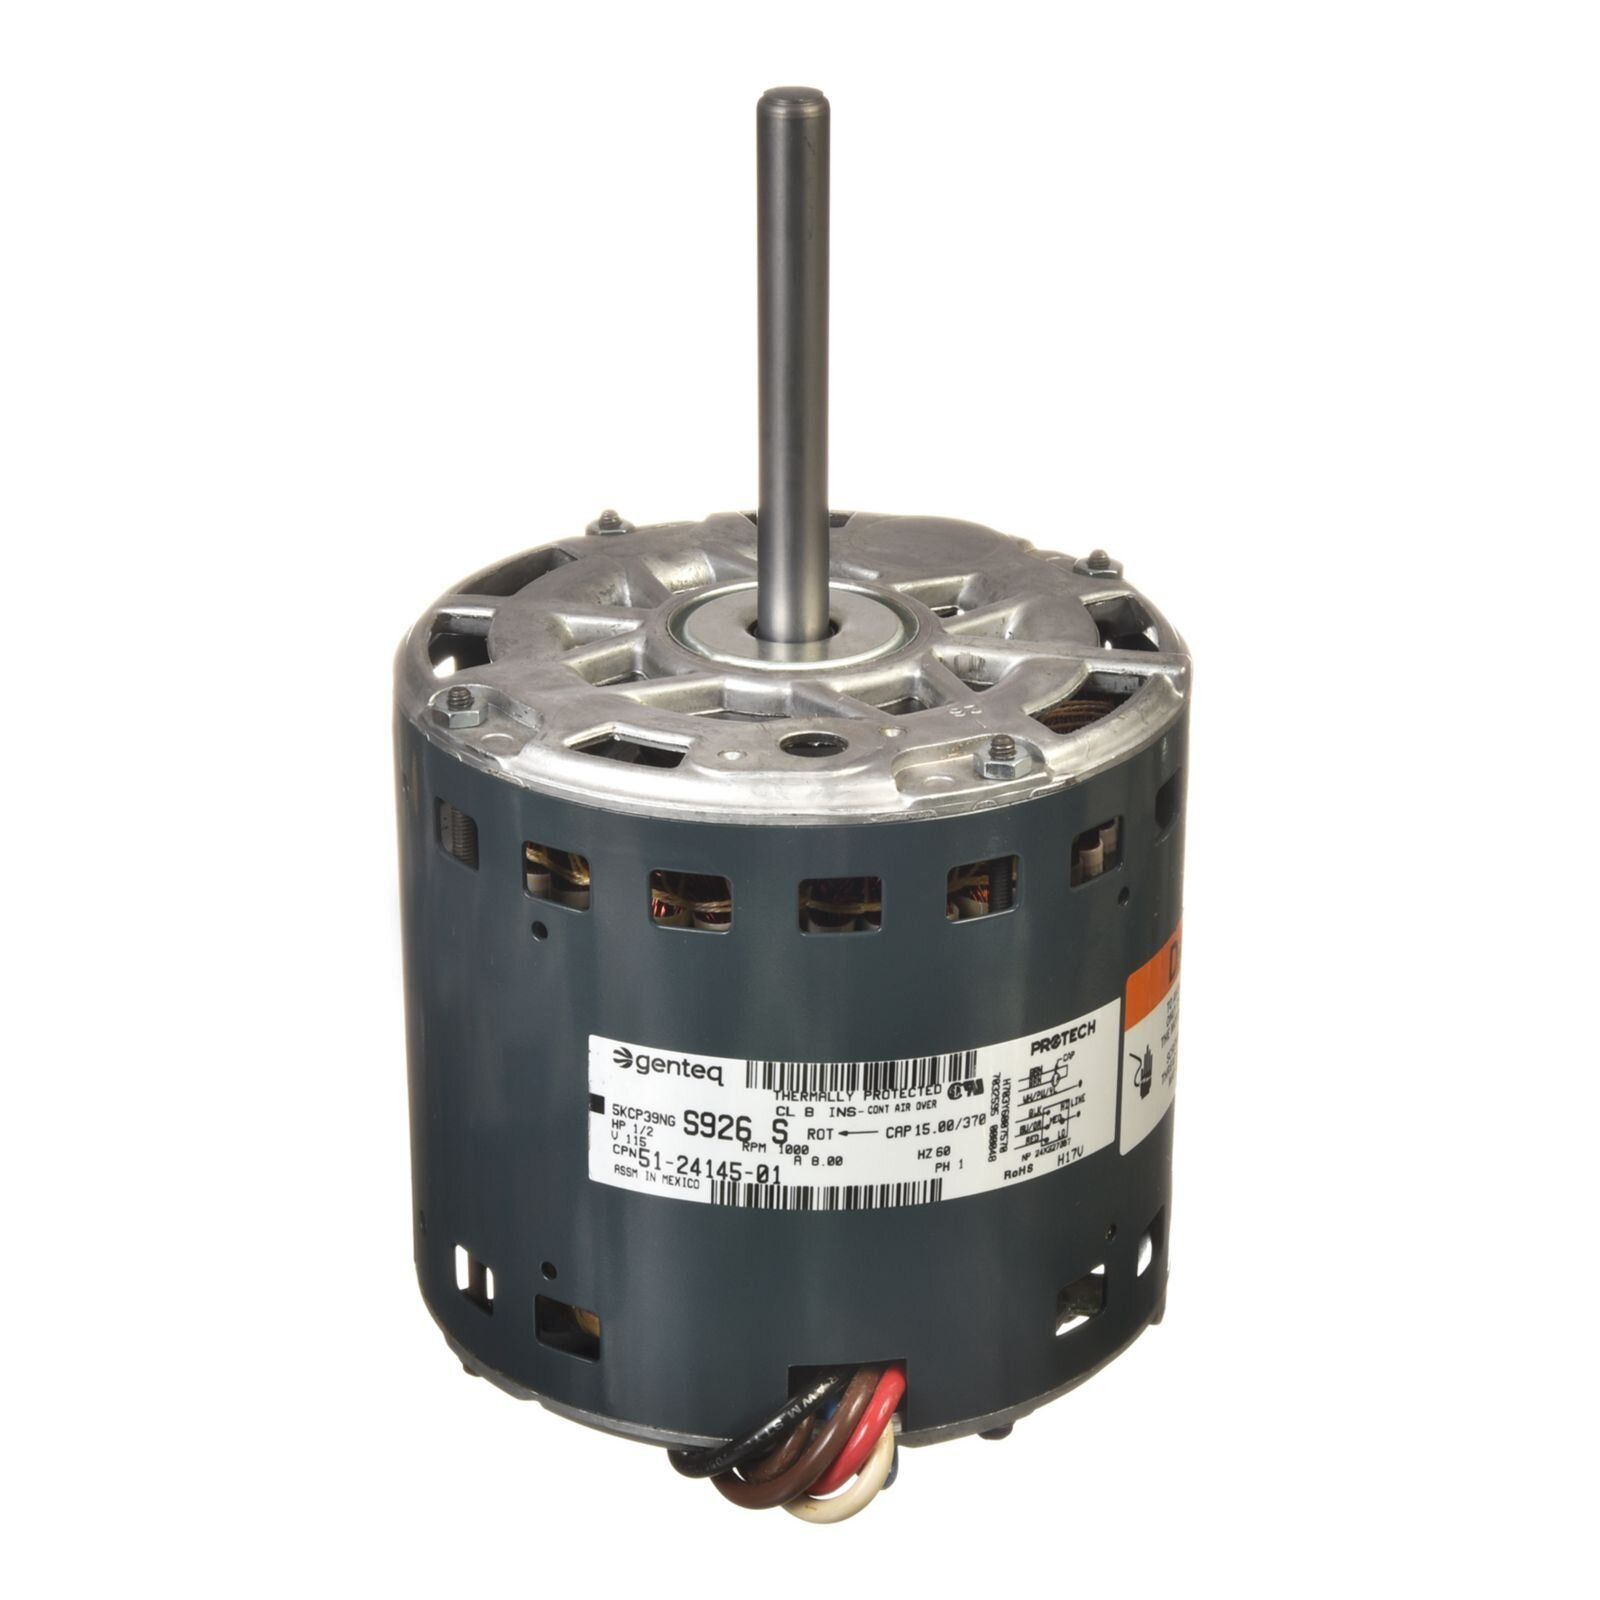 PROTECH 512414501 Blower Motor 1/2 hp 120/1/60 (1075